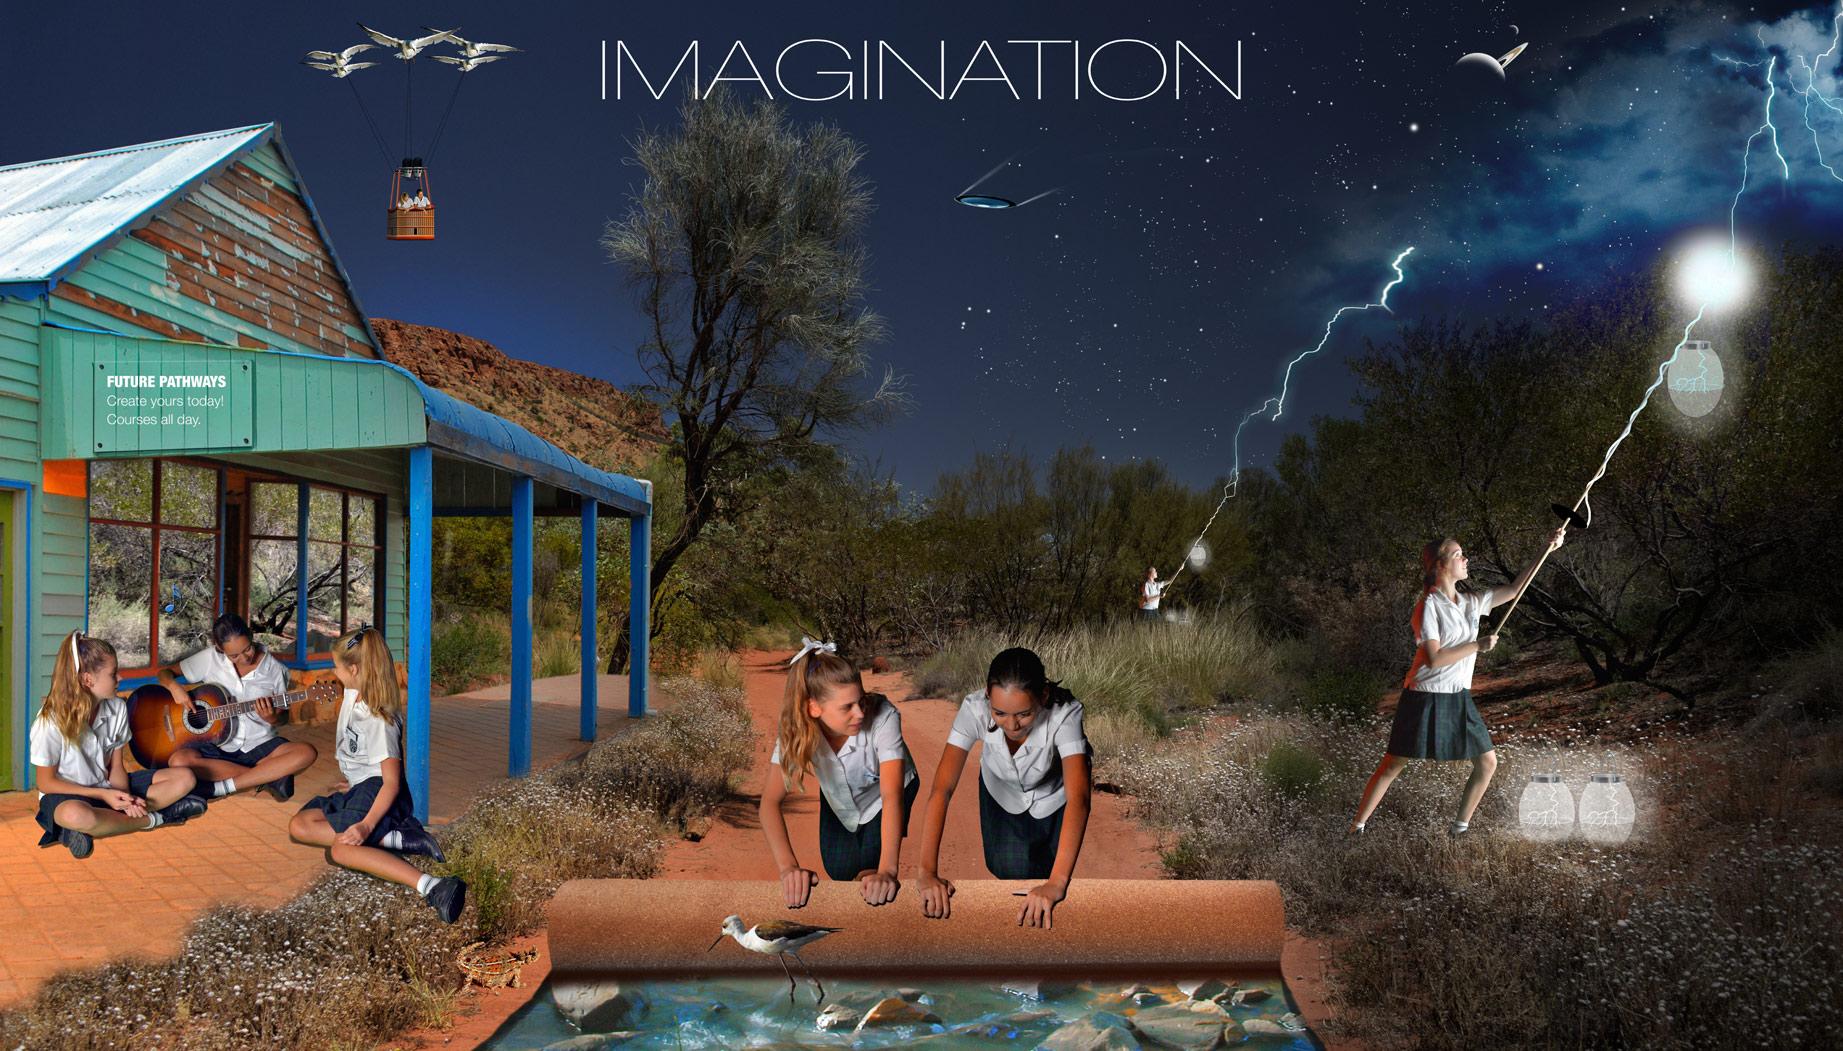 imagination_sized.jpg